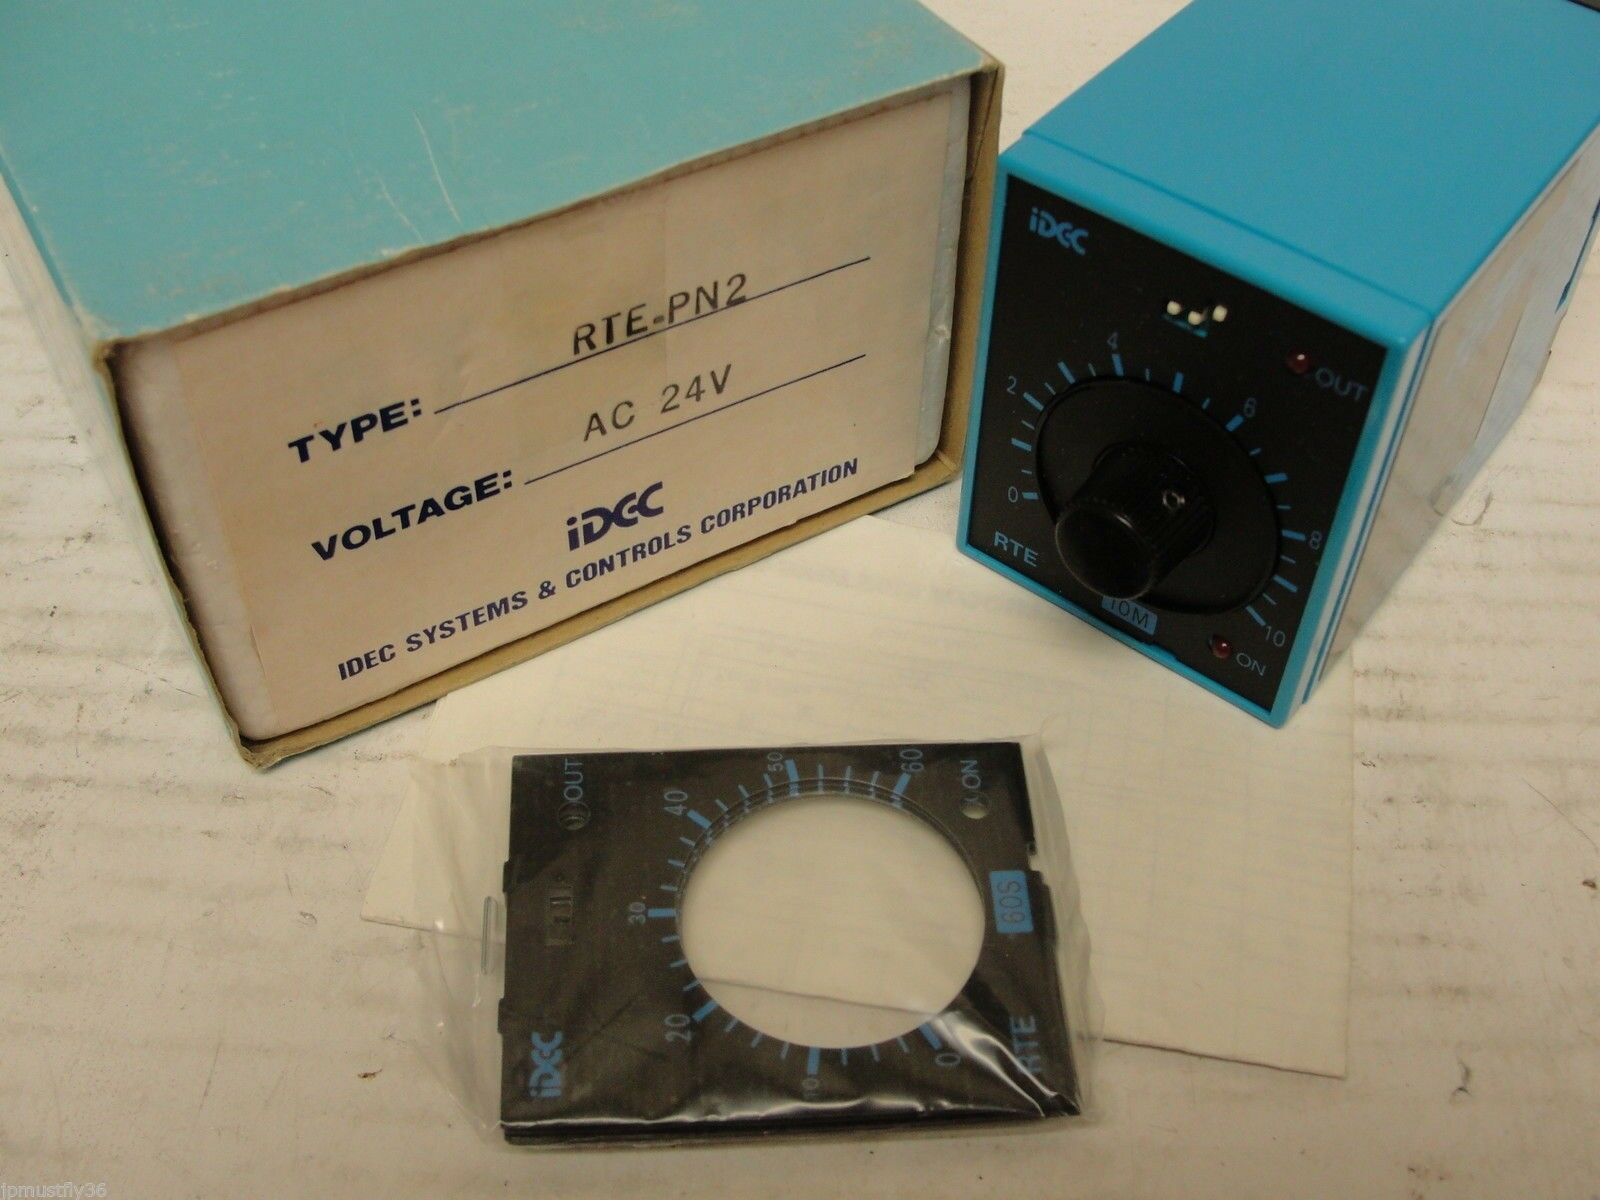 New Idec electronic timer RTE-PN2, AC 24V